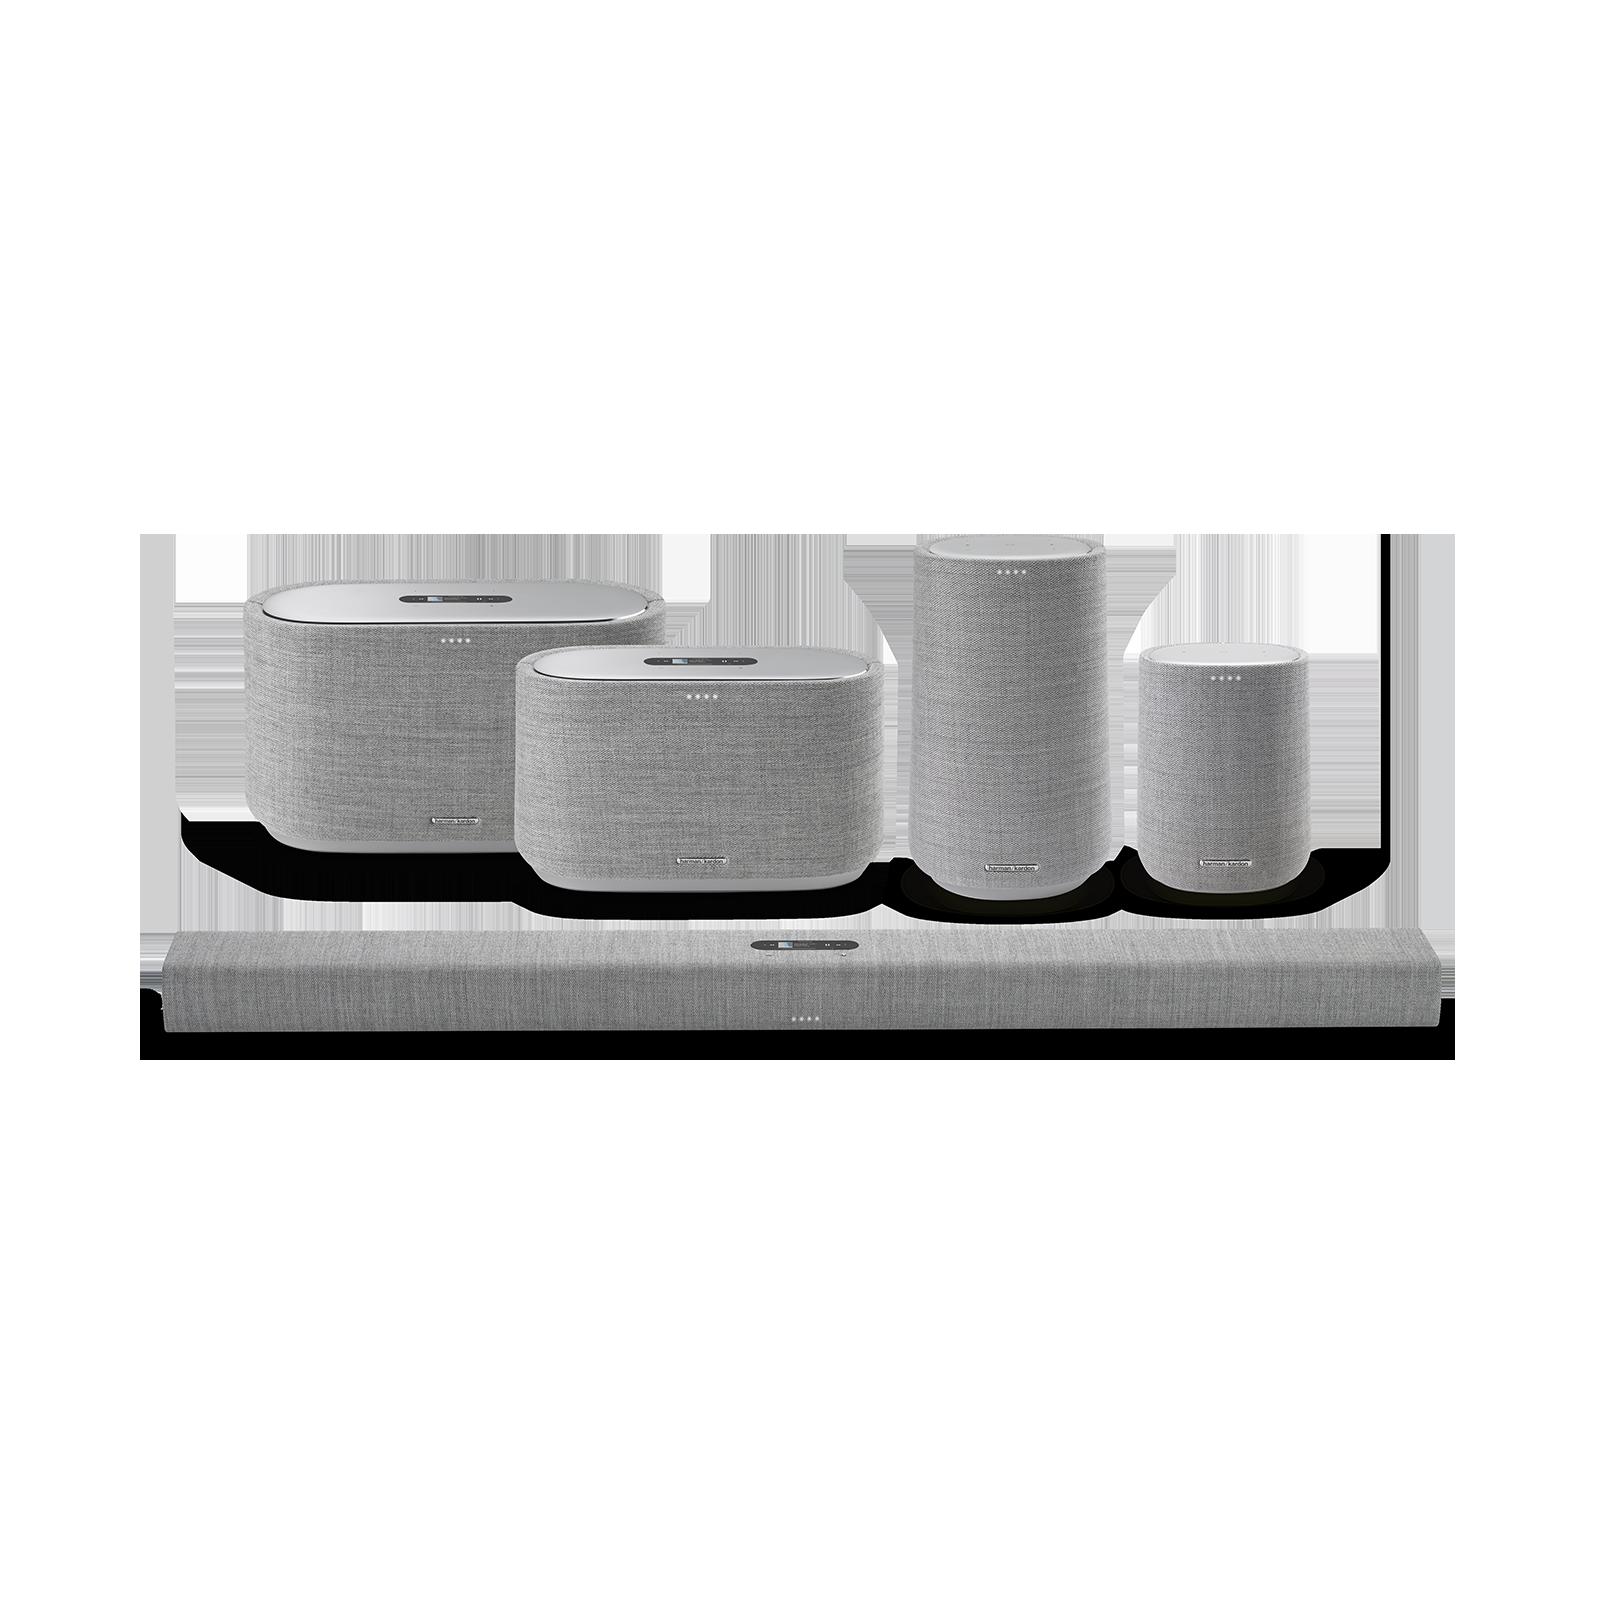 Harman Kardon Citation 100 - Grey - The smallest, smartest home speaker with impactful sound - Detailshot 5